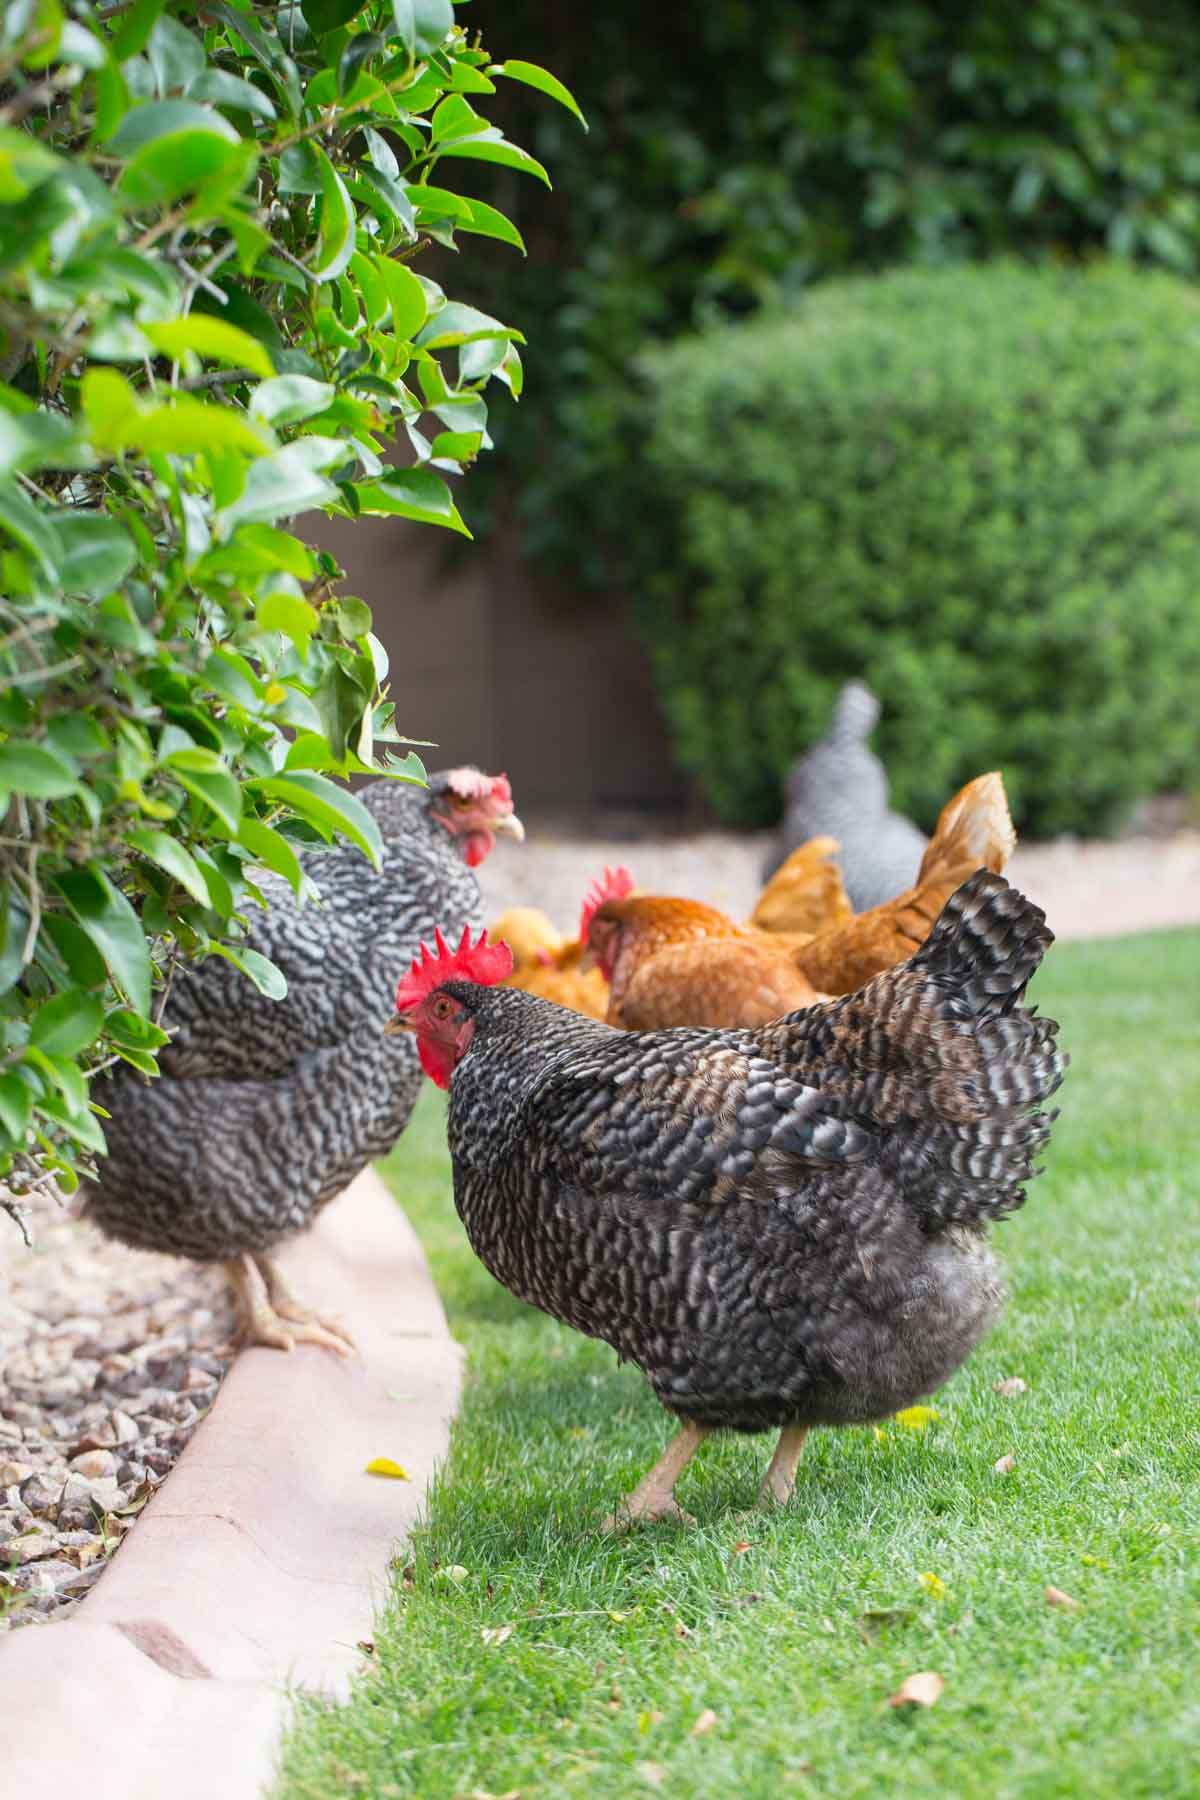 Flock of backyard chickens